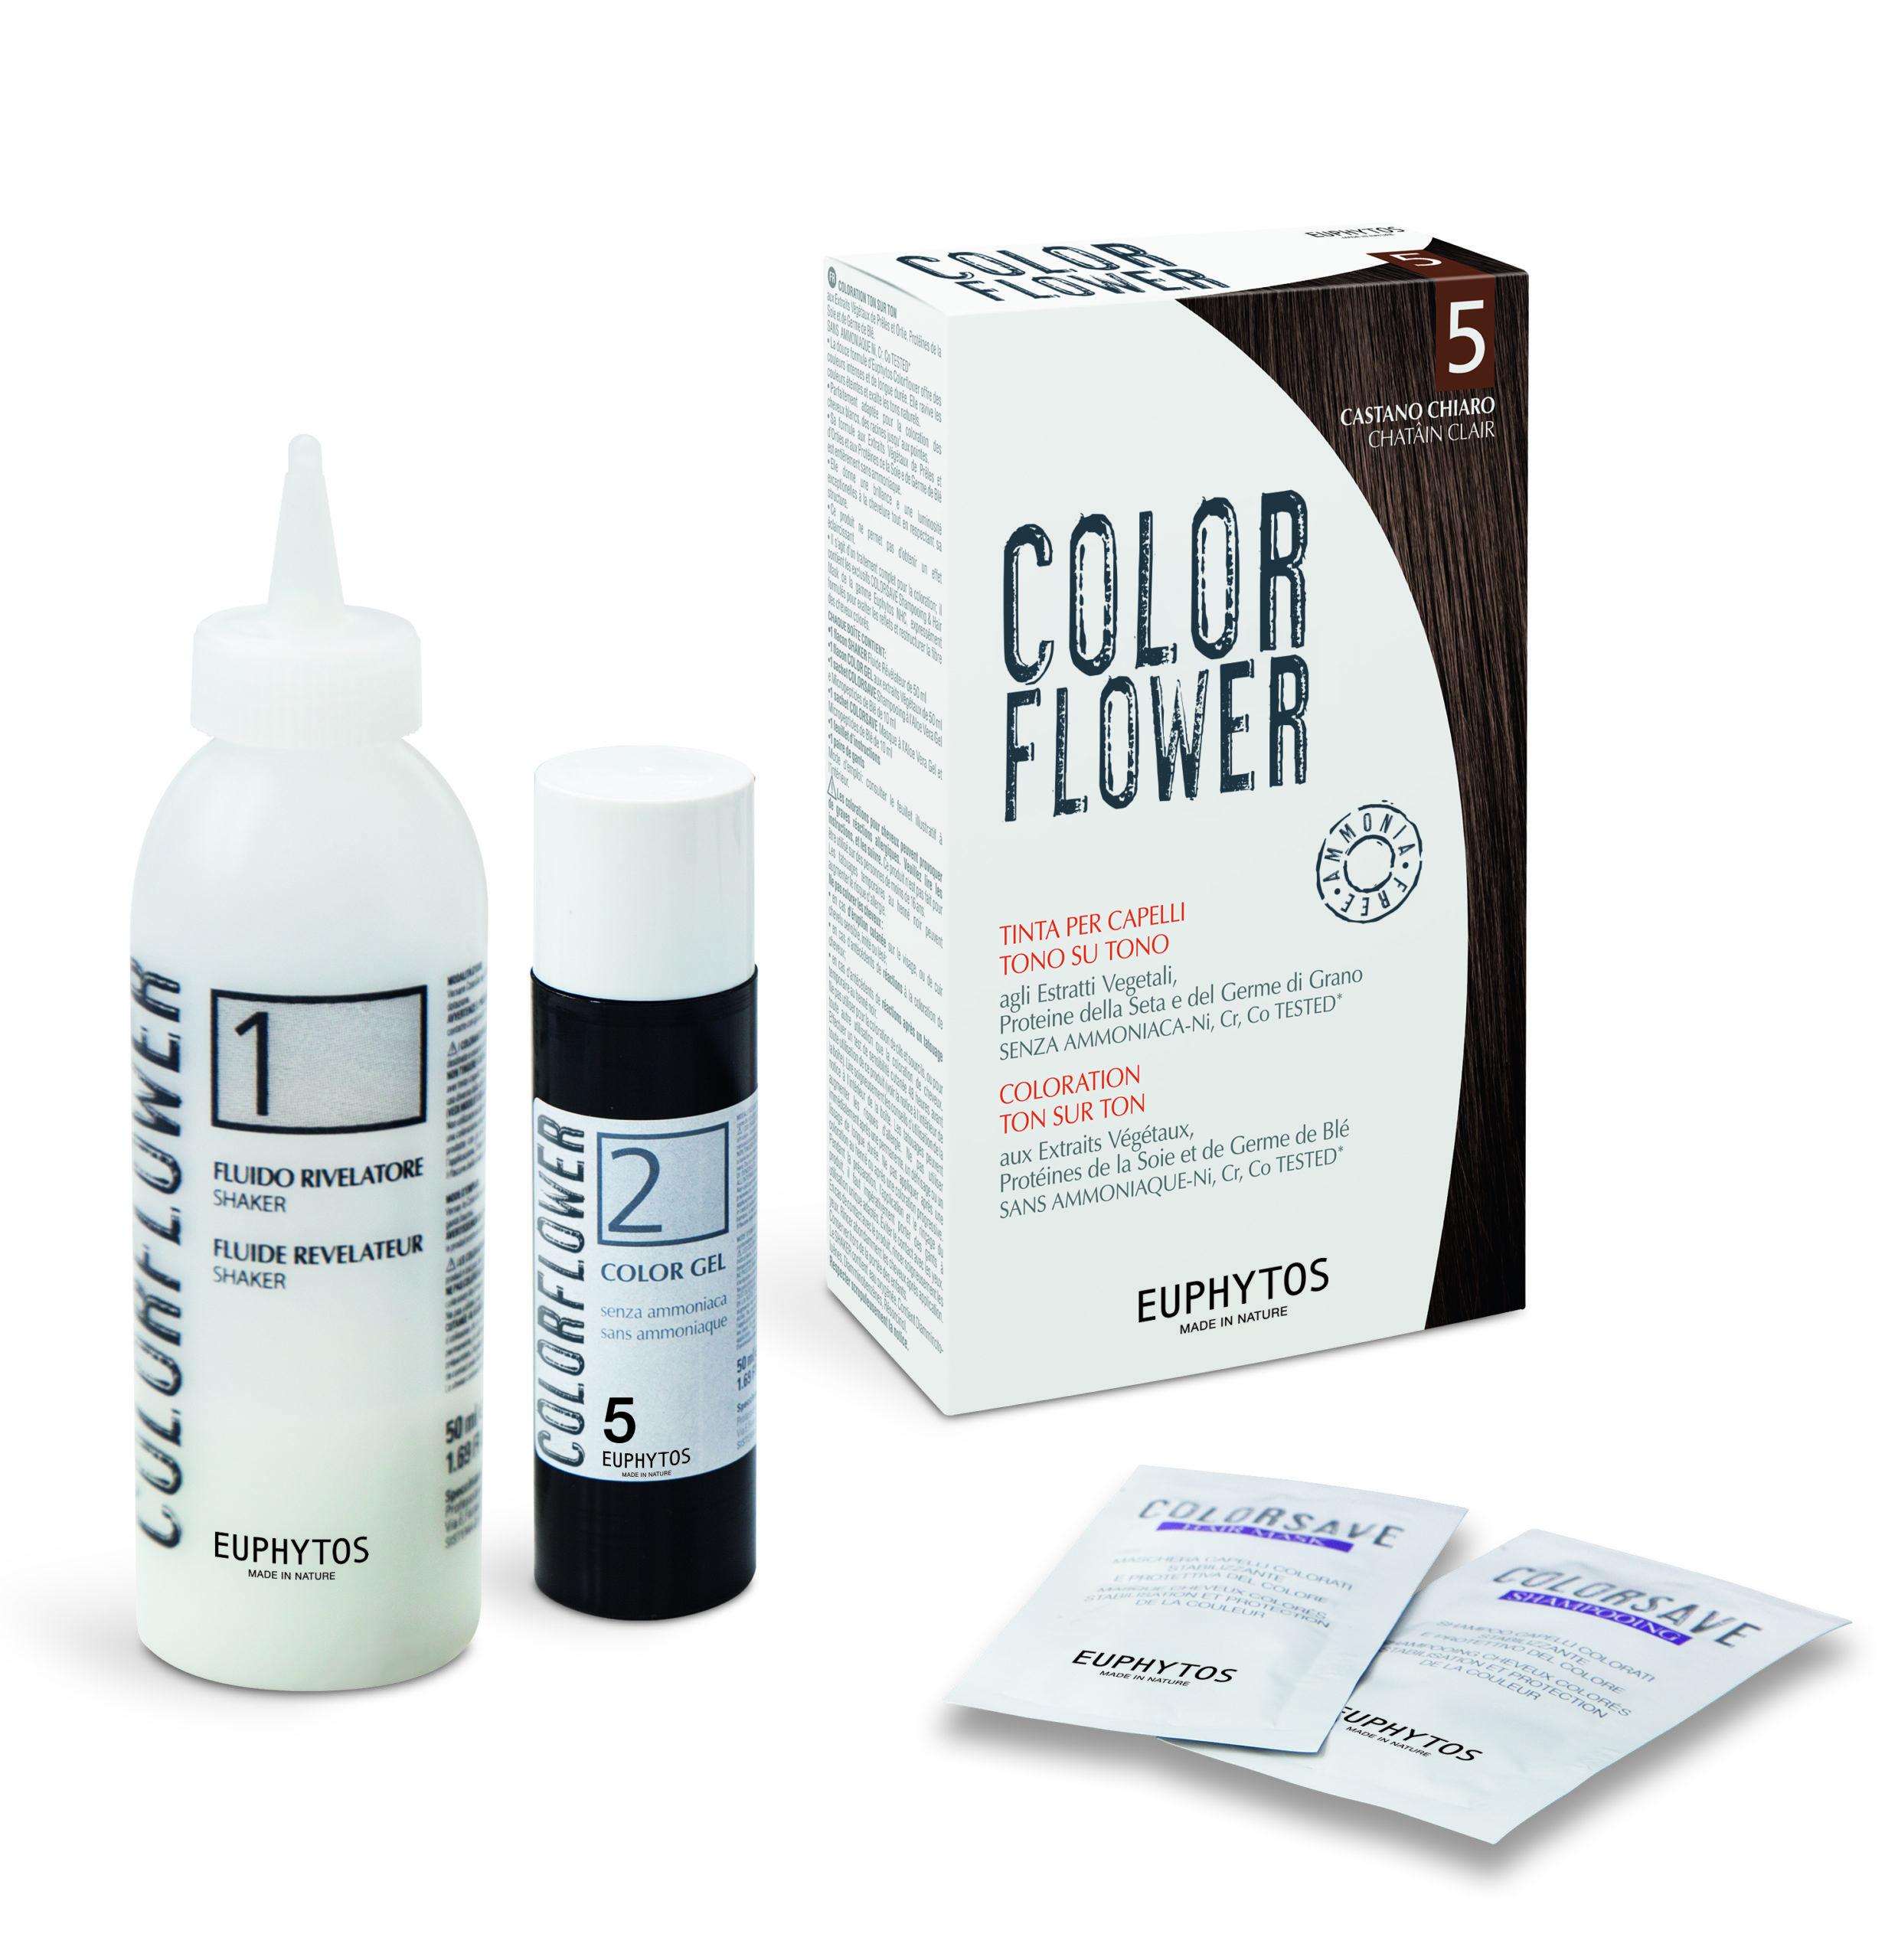 Pack-Color-Flower-5-scaled.jpg